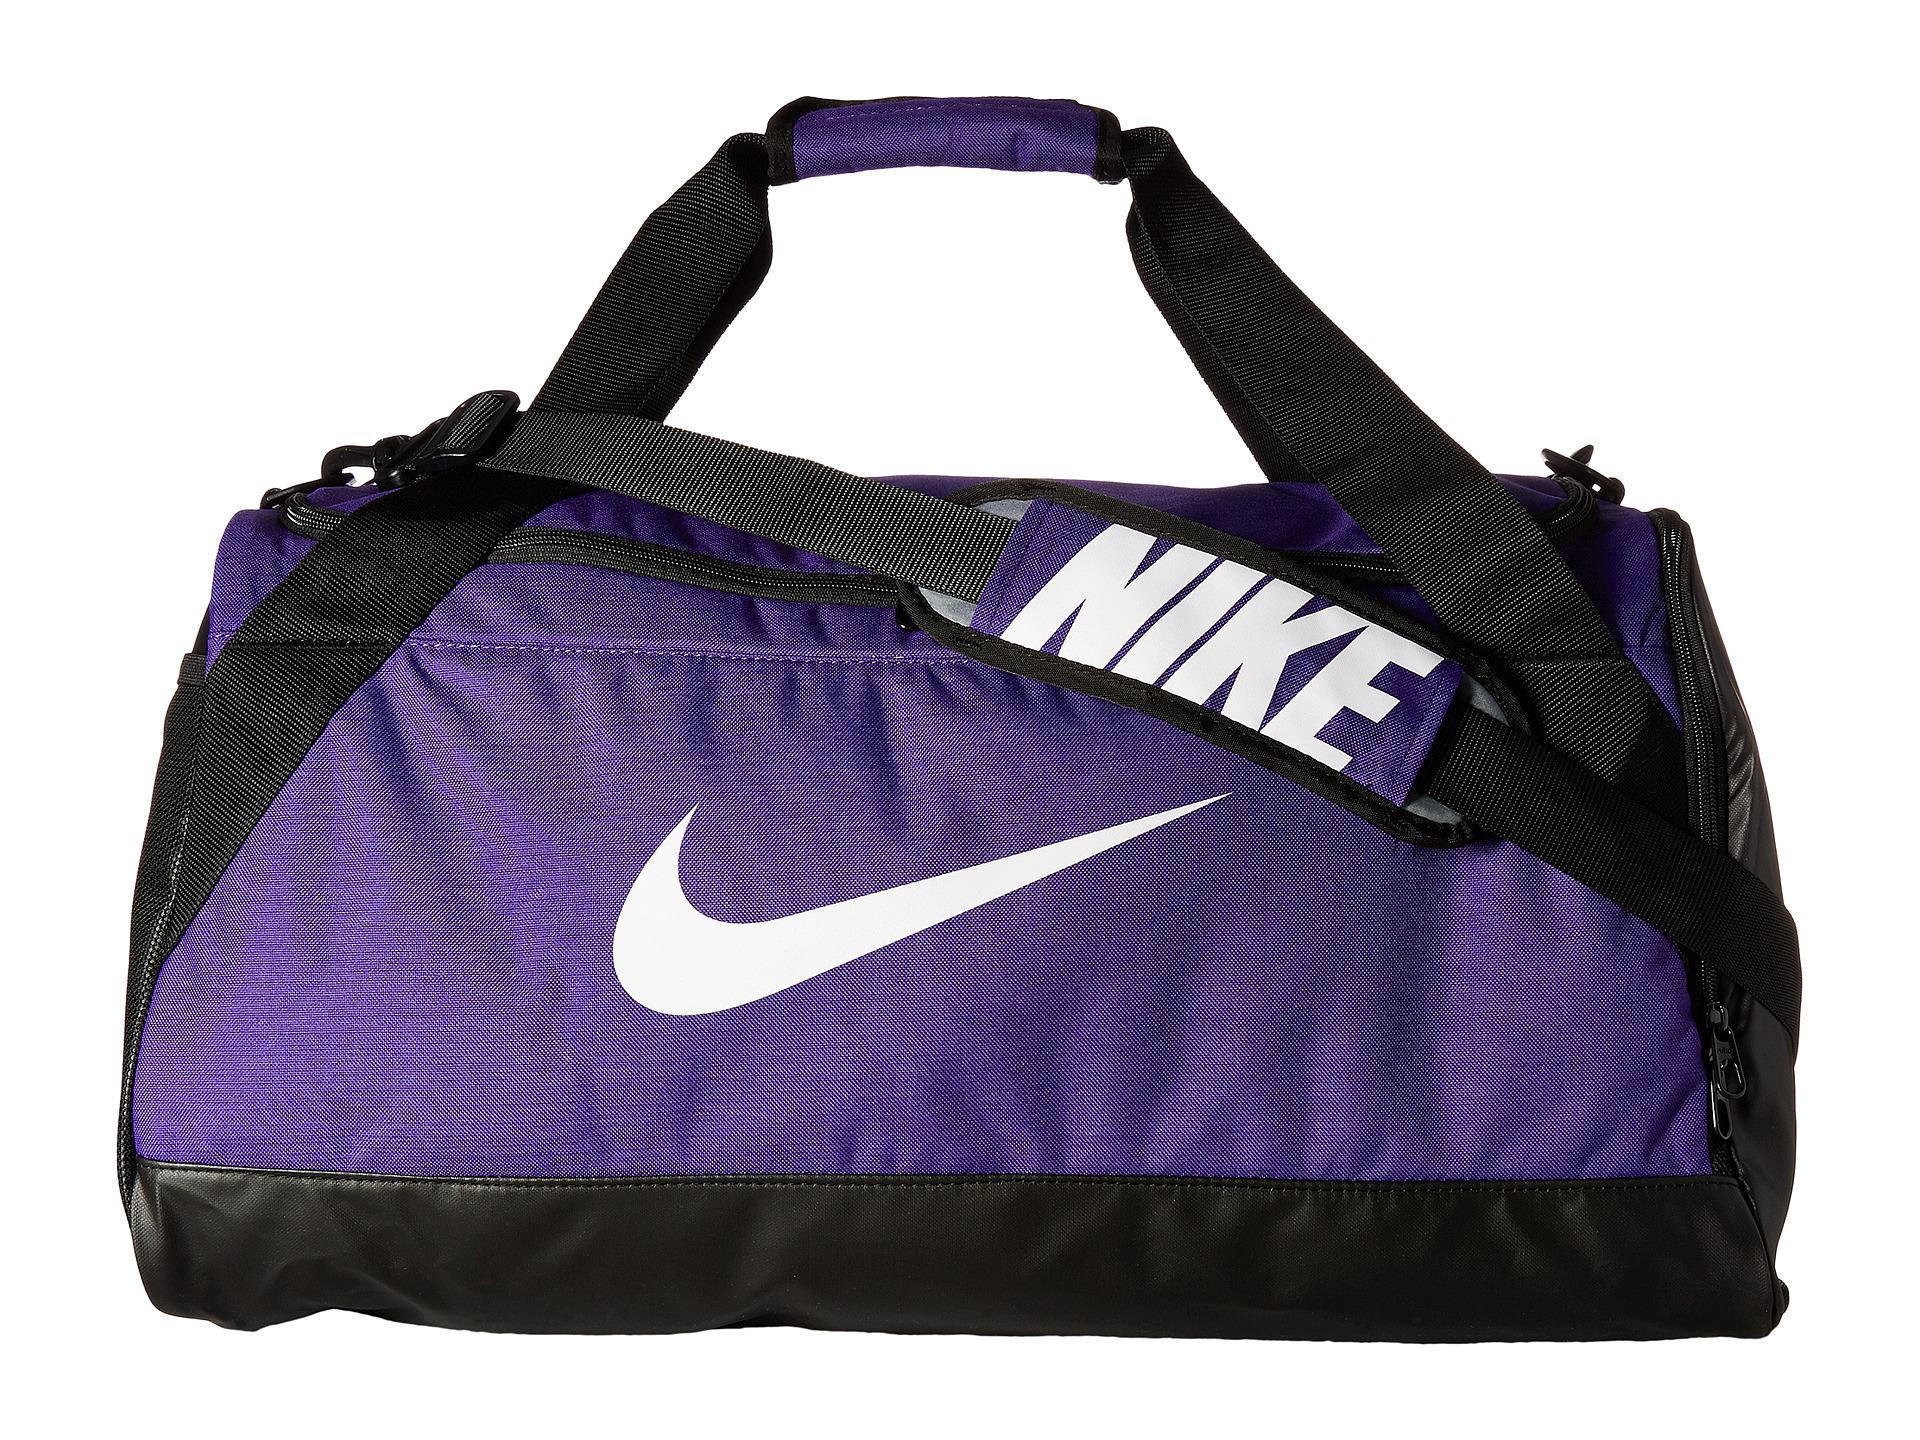 93ad8e50108a Lyst - Nike Brasilia Medium Duffel Bag in Purple for Men